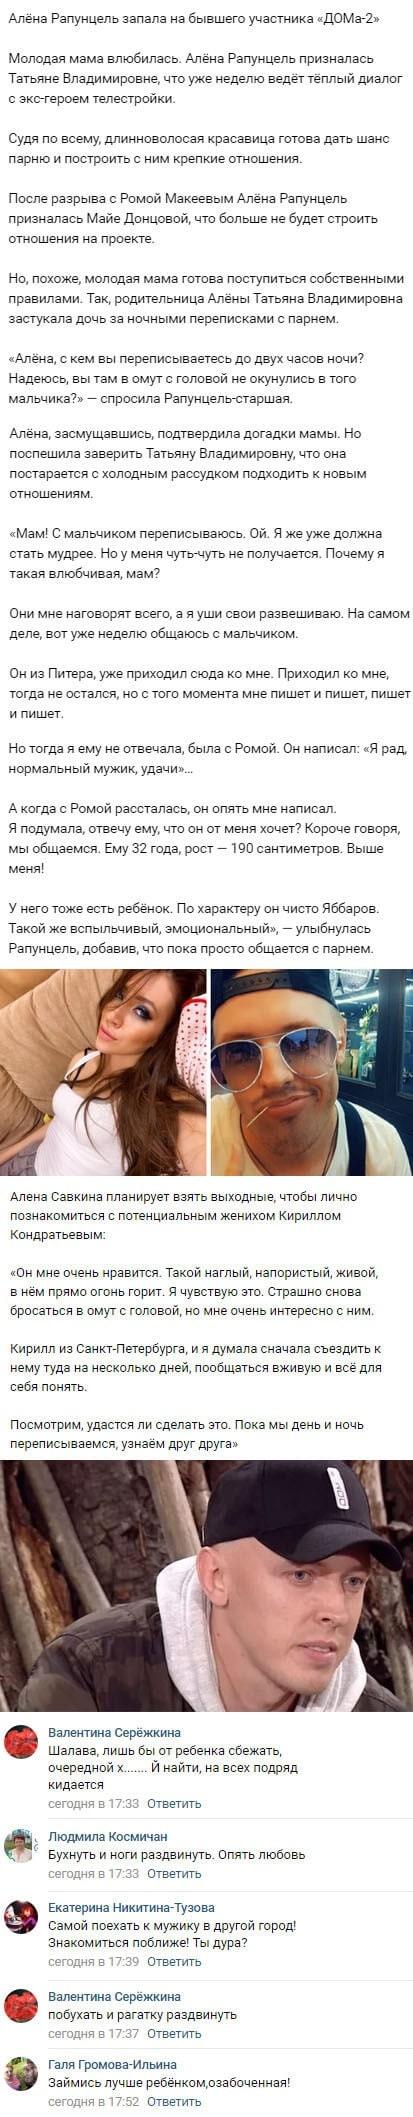 Алена Савкина закрутила новый роман